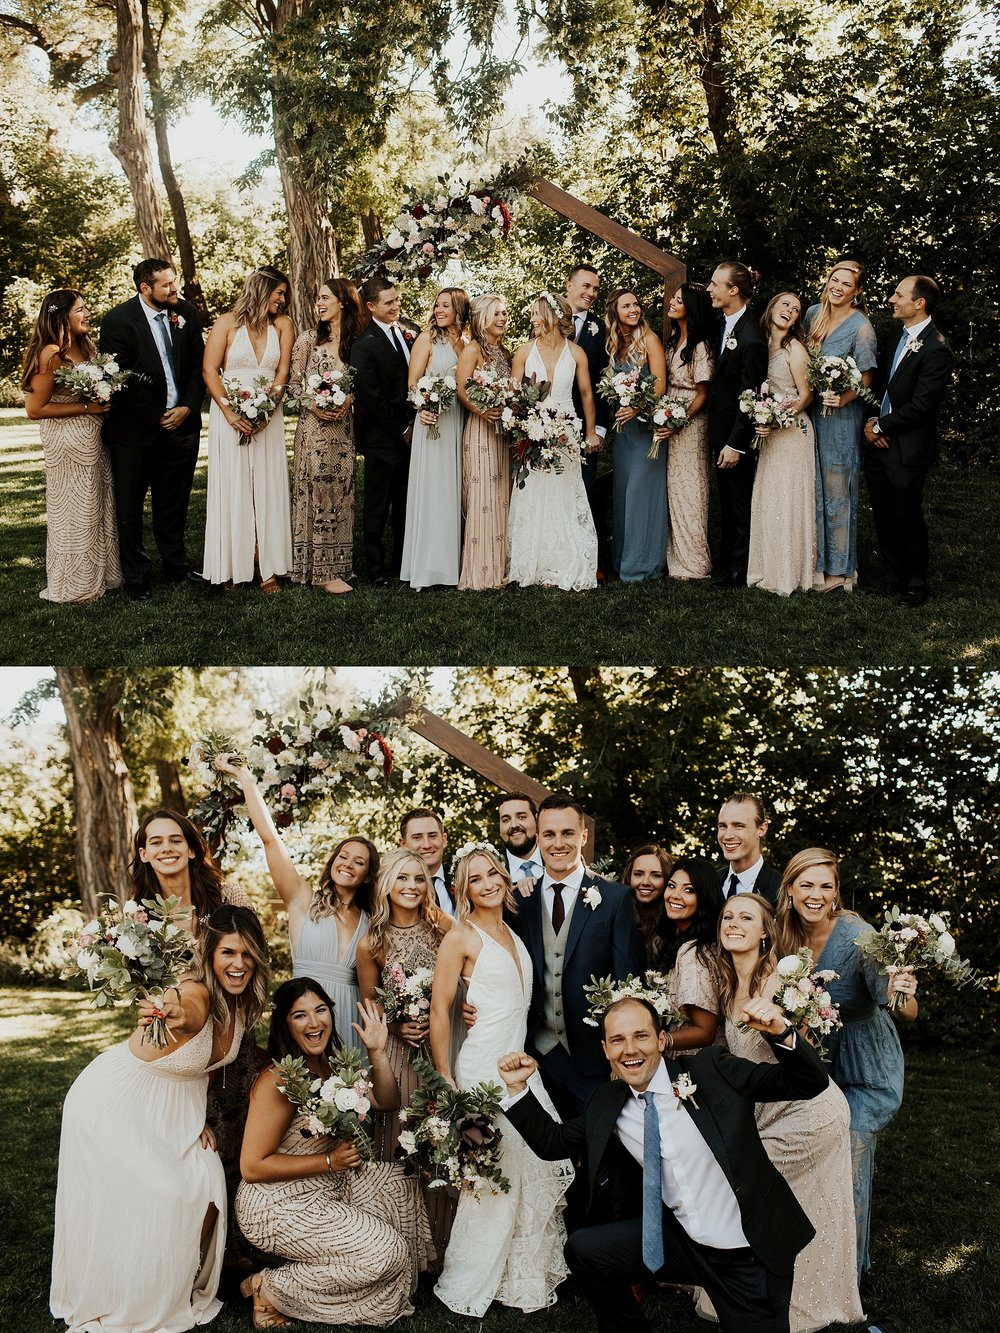 Lyons_Farmette_Wedding_Denver_Colorado_wedding049.JPG